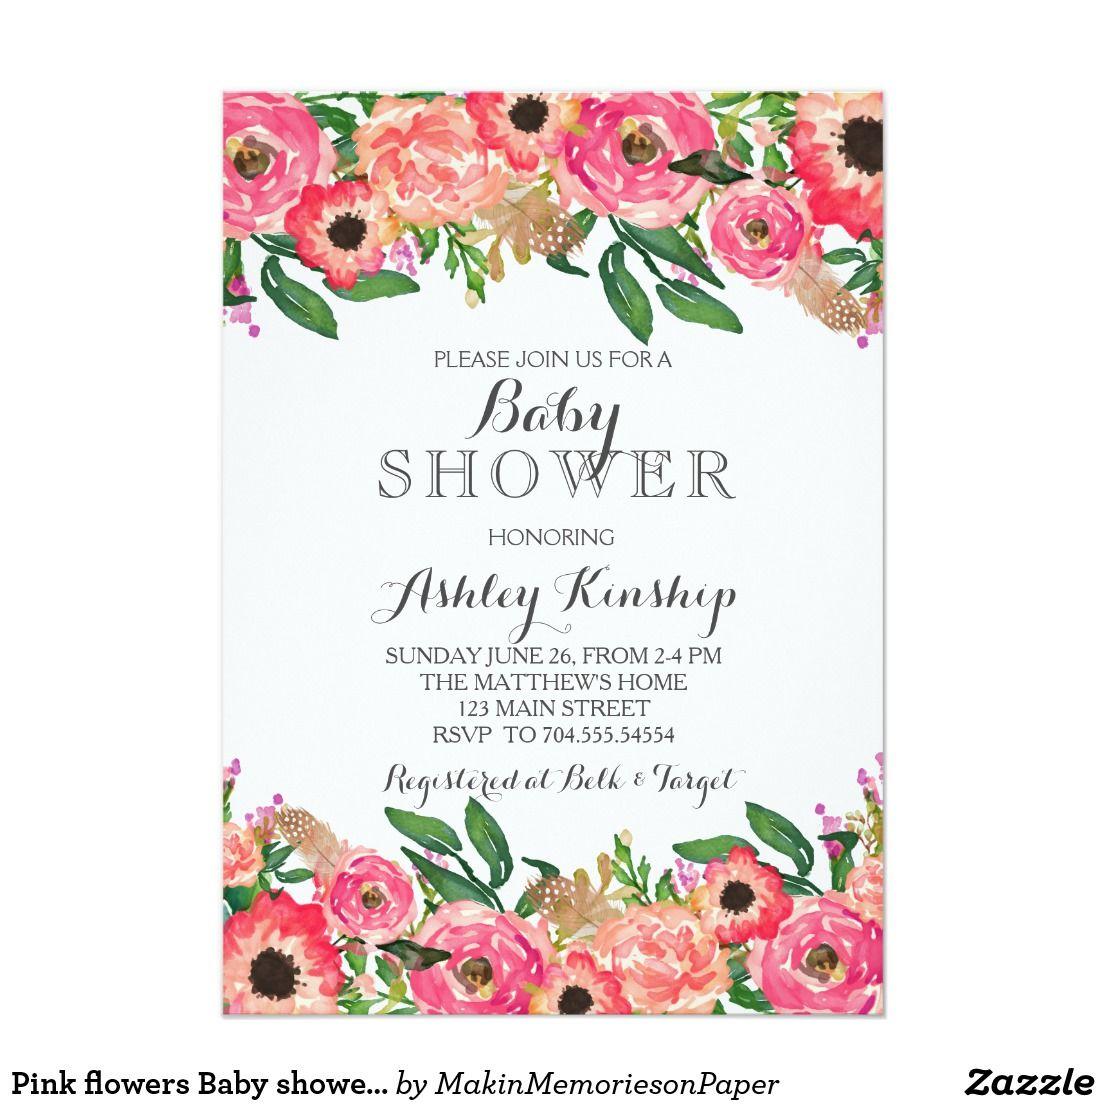 Pink flowers Baby shower invitation